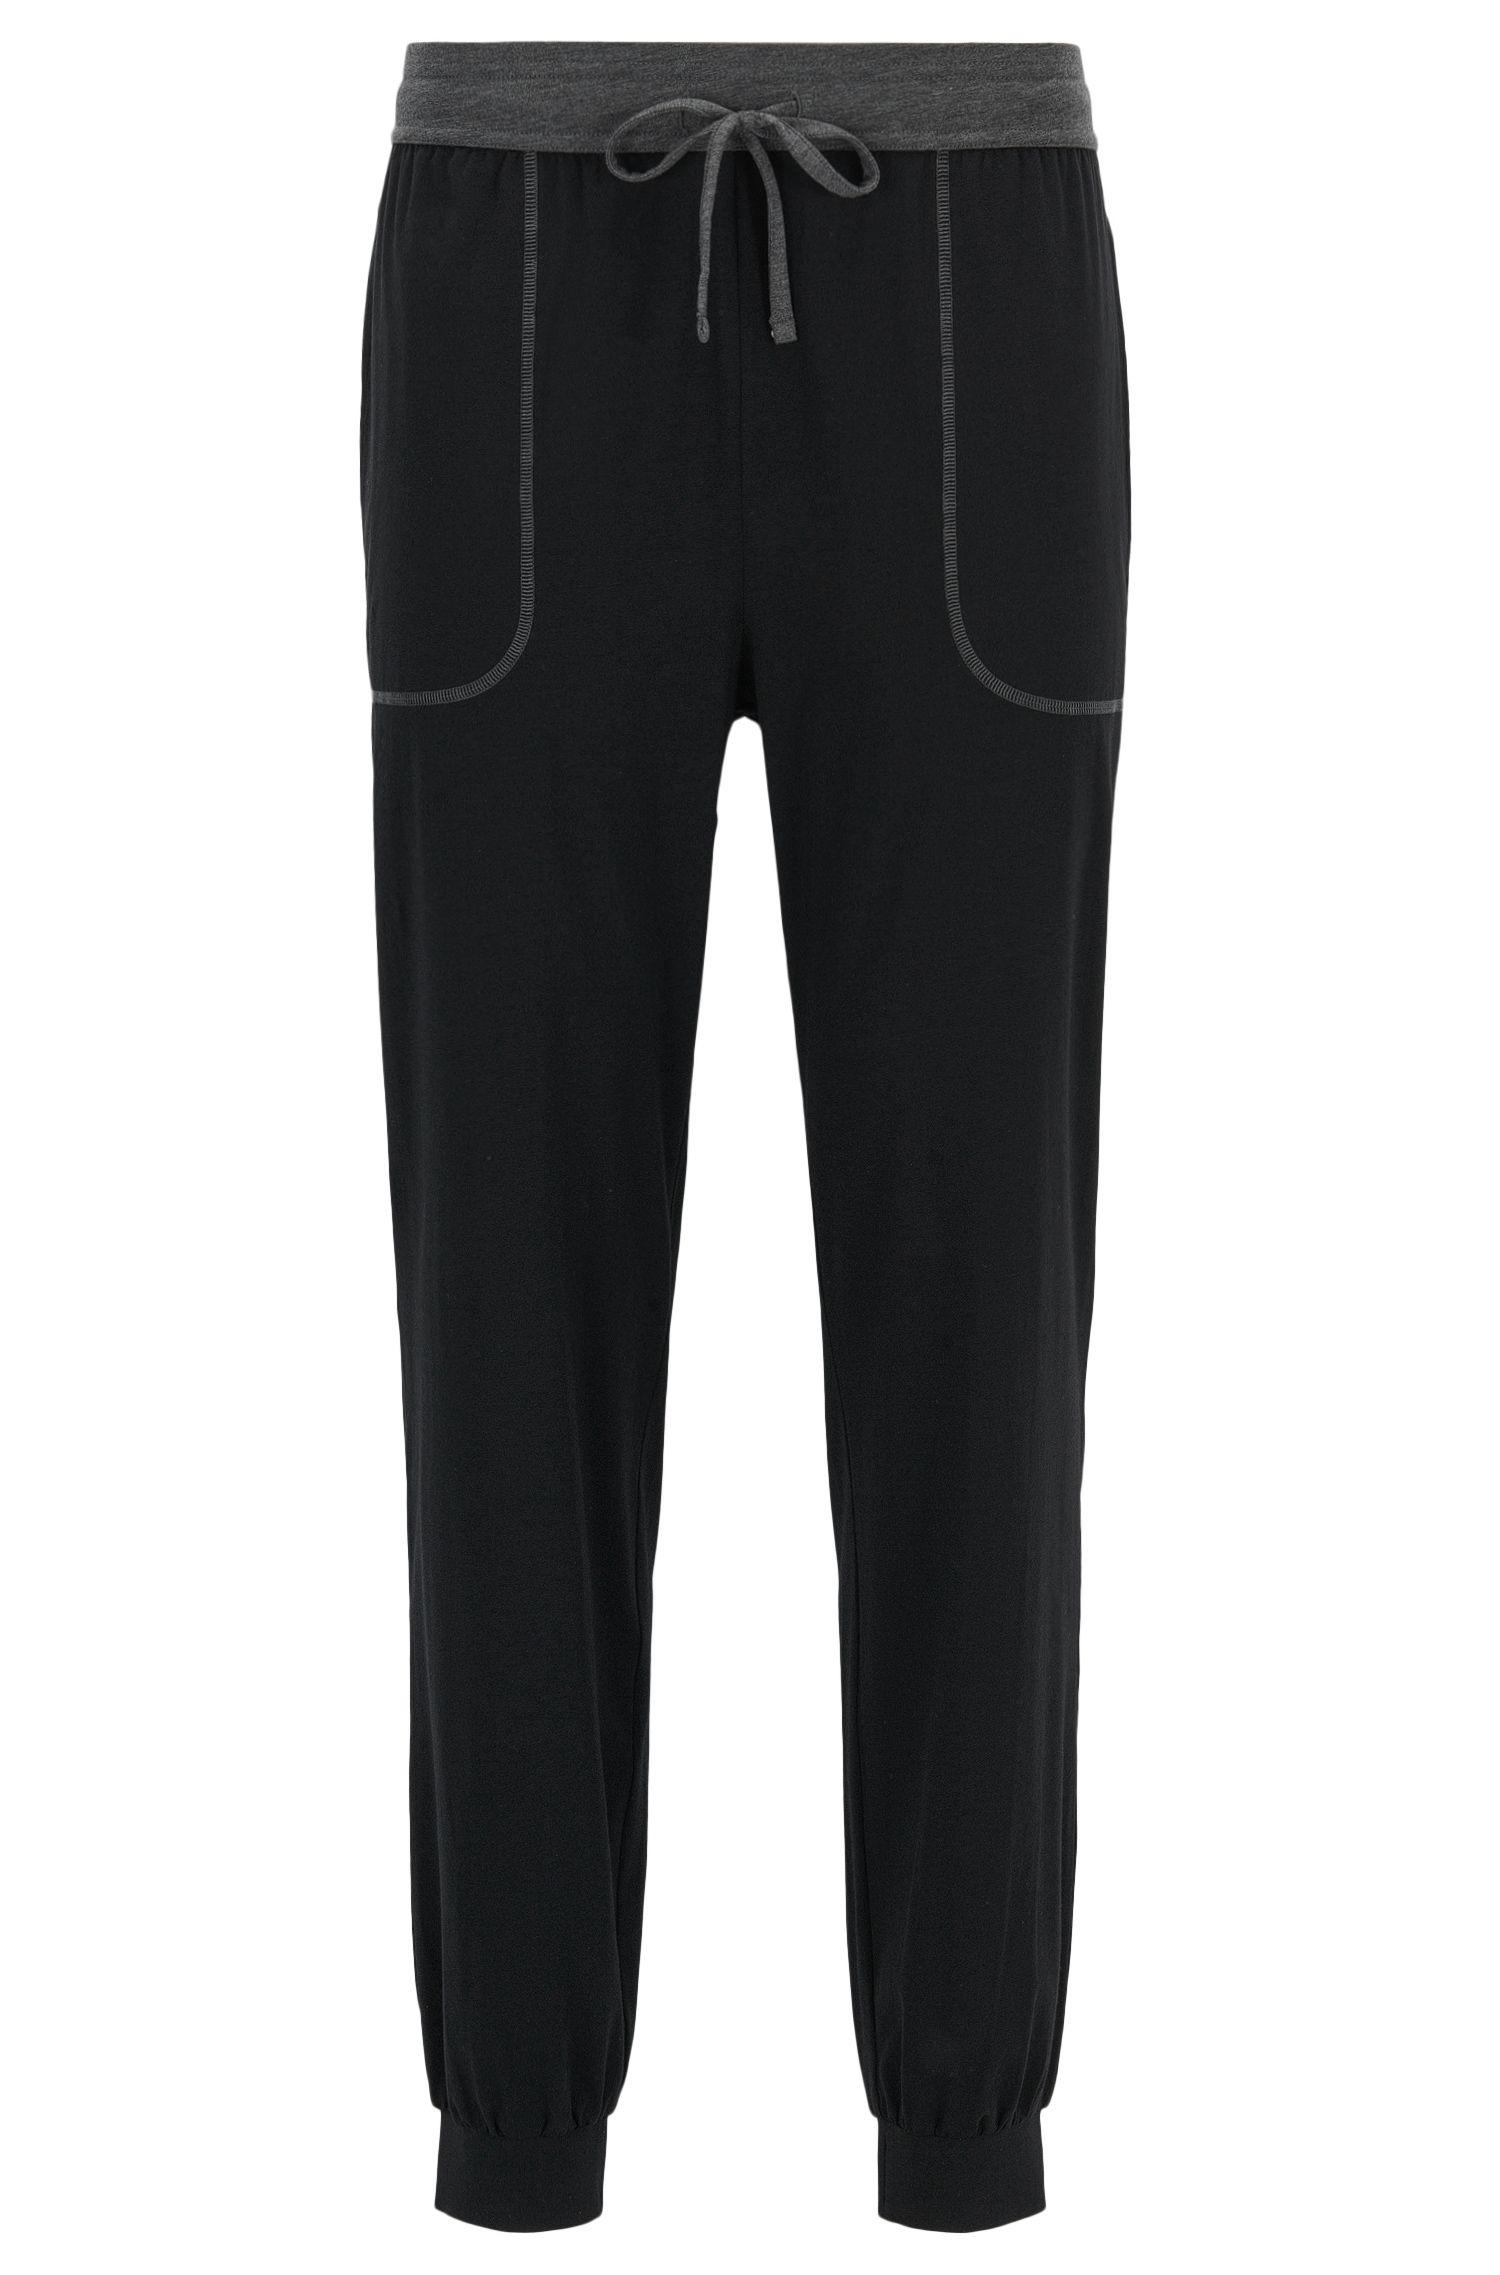 Cuffed hem pyjama bottoms in stretch cotton-blend jersey